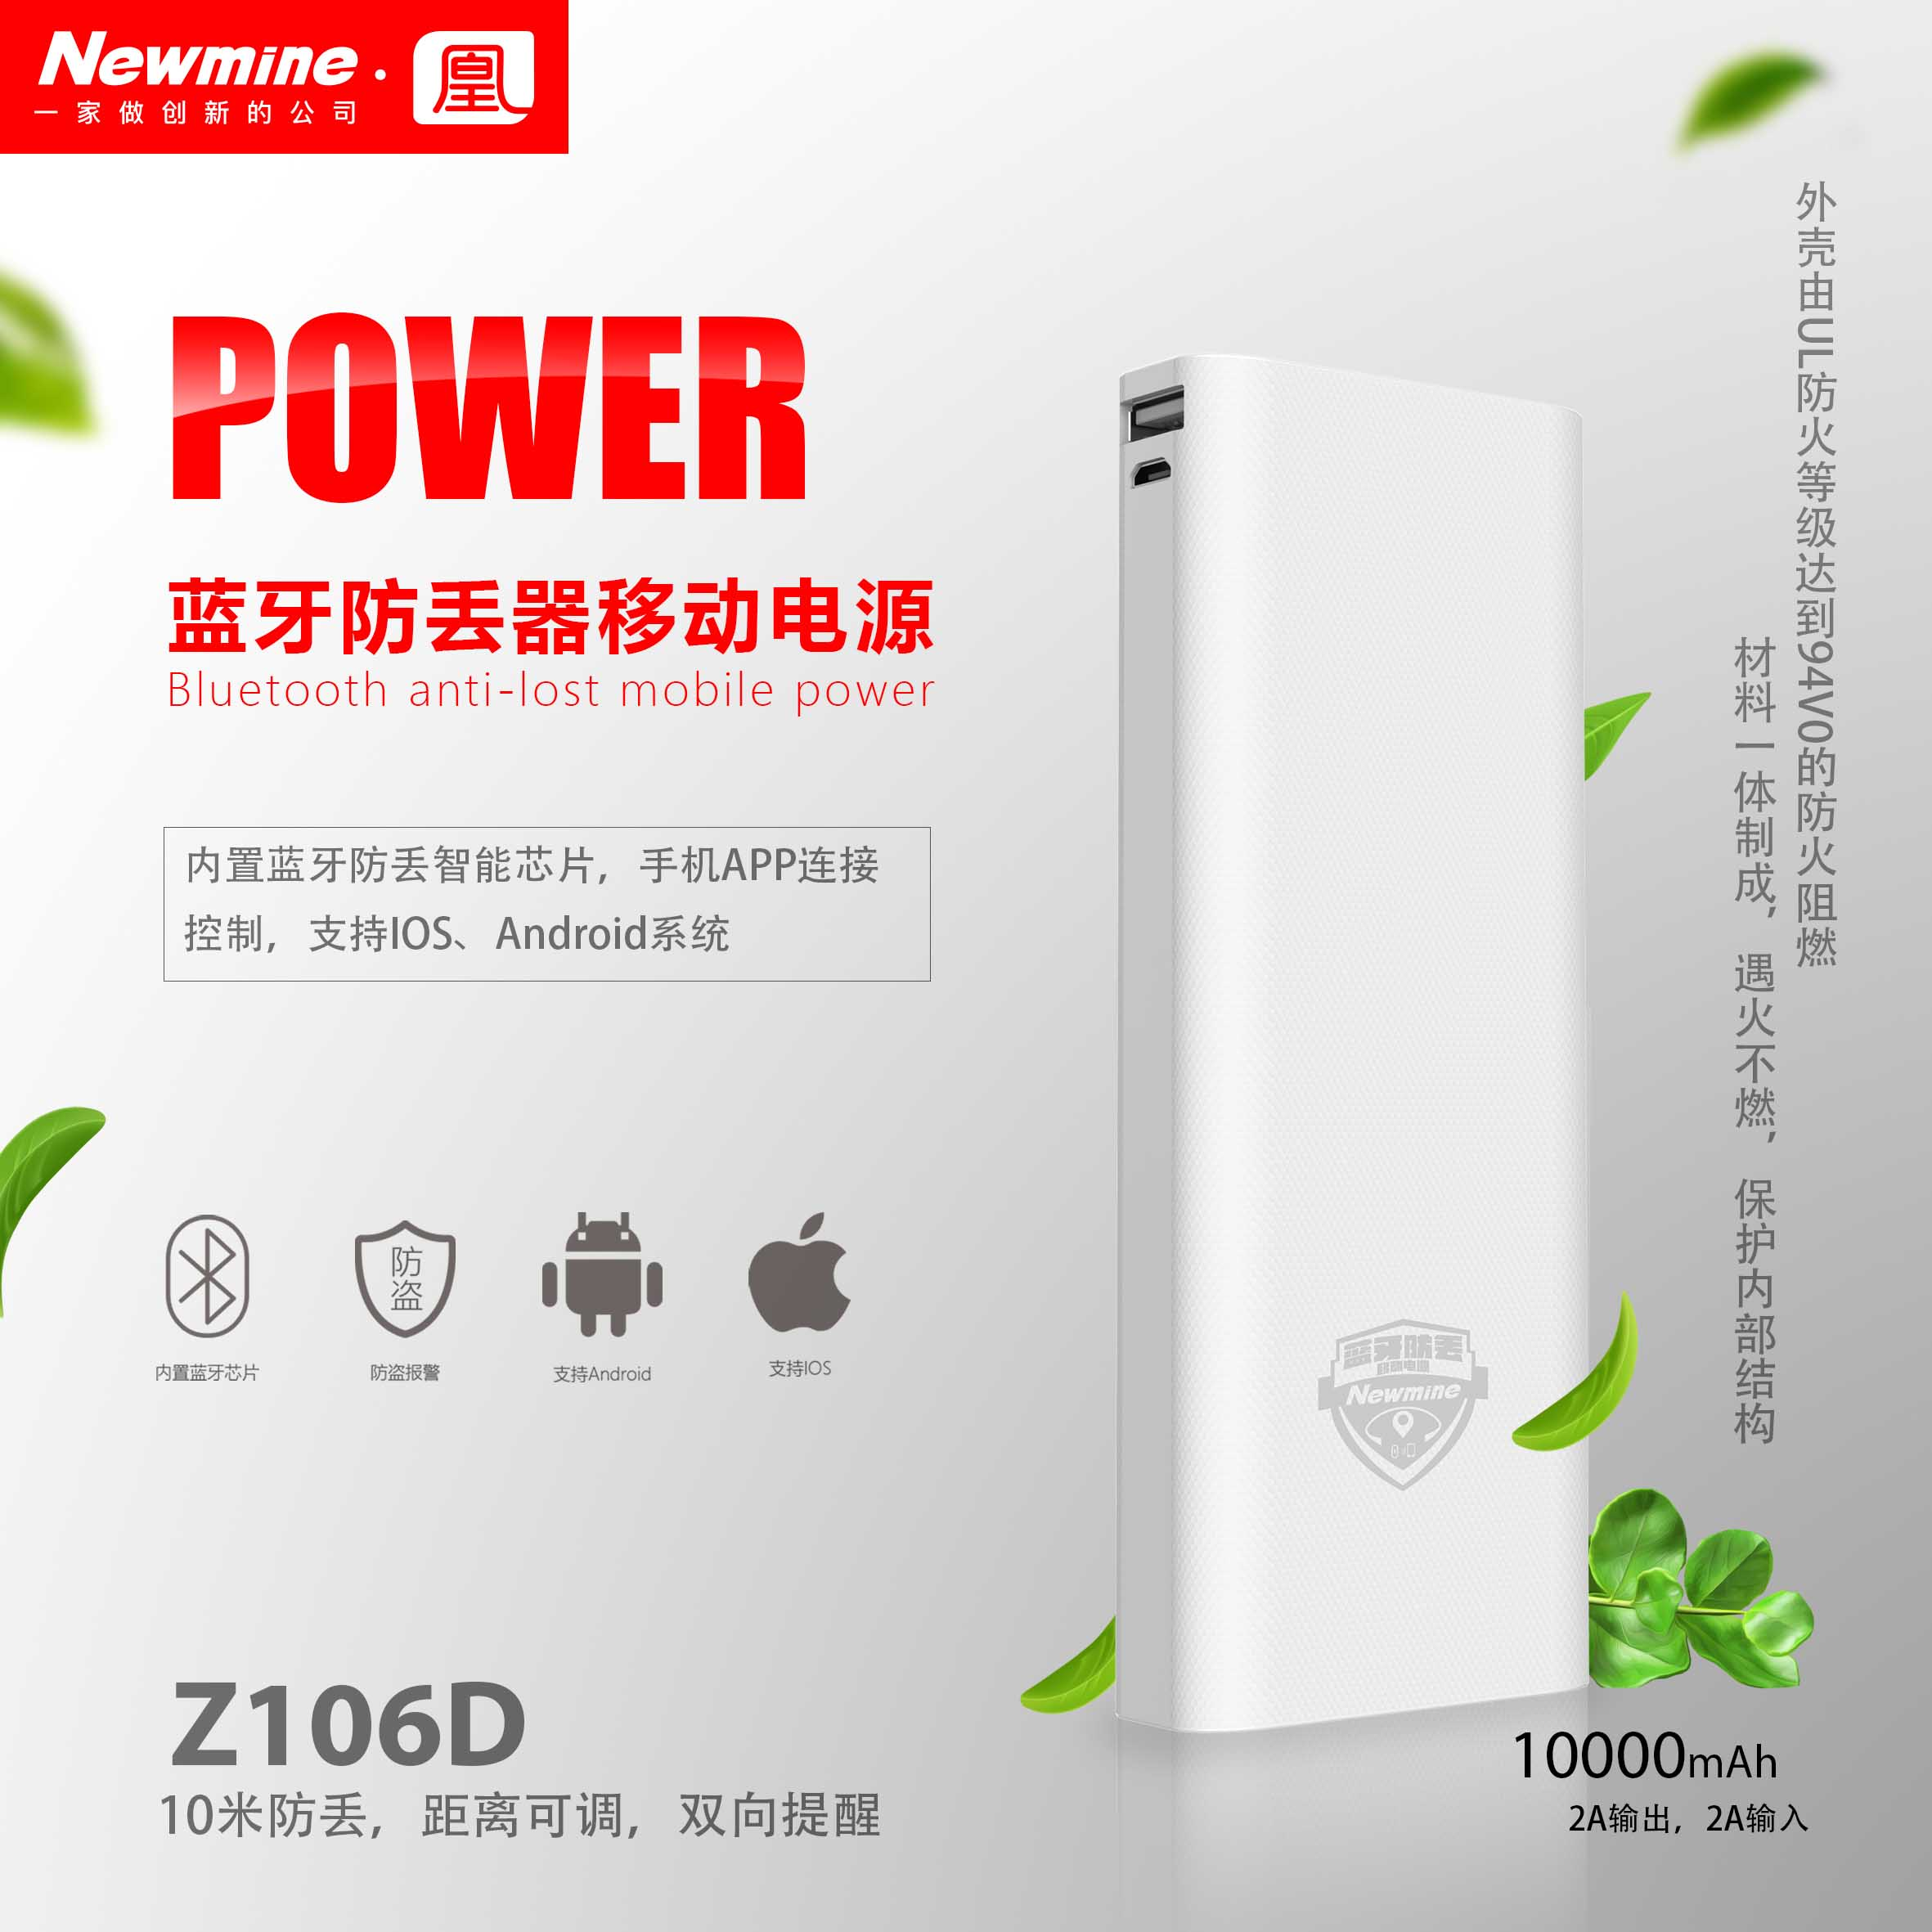 Z106D 蓝牙防丢器移动电源 10000mAh